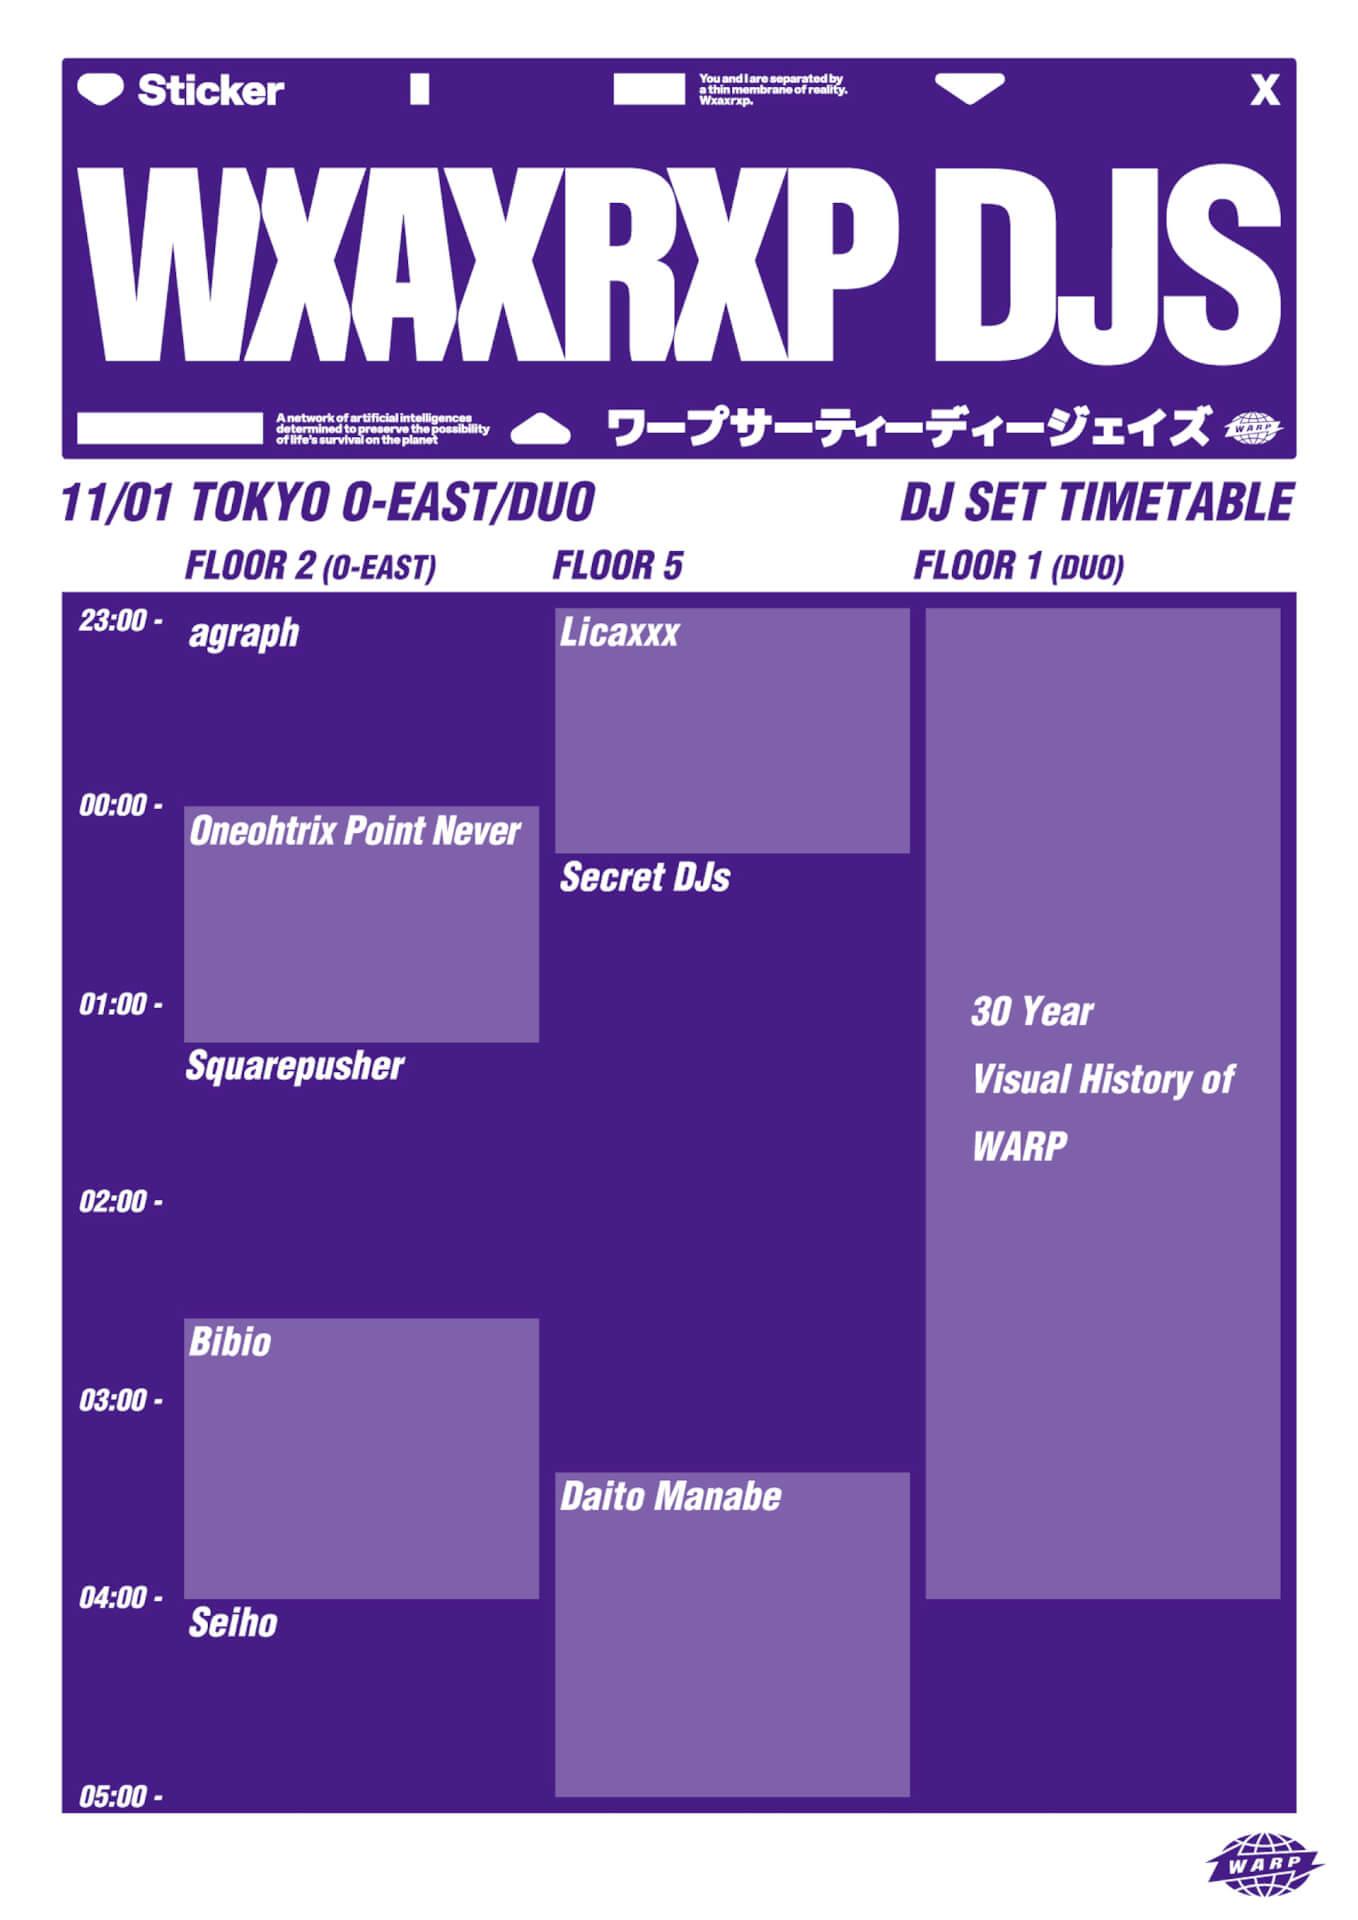 〈WARP RECORDS〉30周年スペシャル・パーティー<WXAXRXP DJS>の全アクトが発表!東京に真鍋大度、大阪・京都に原摩利彦が登場 WXAXAXP_timetable_tokyo